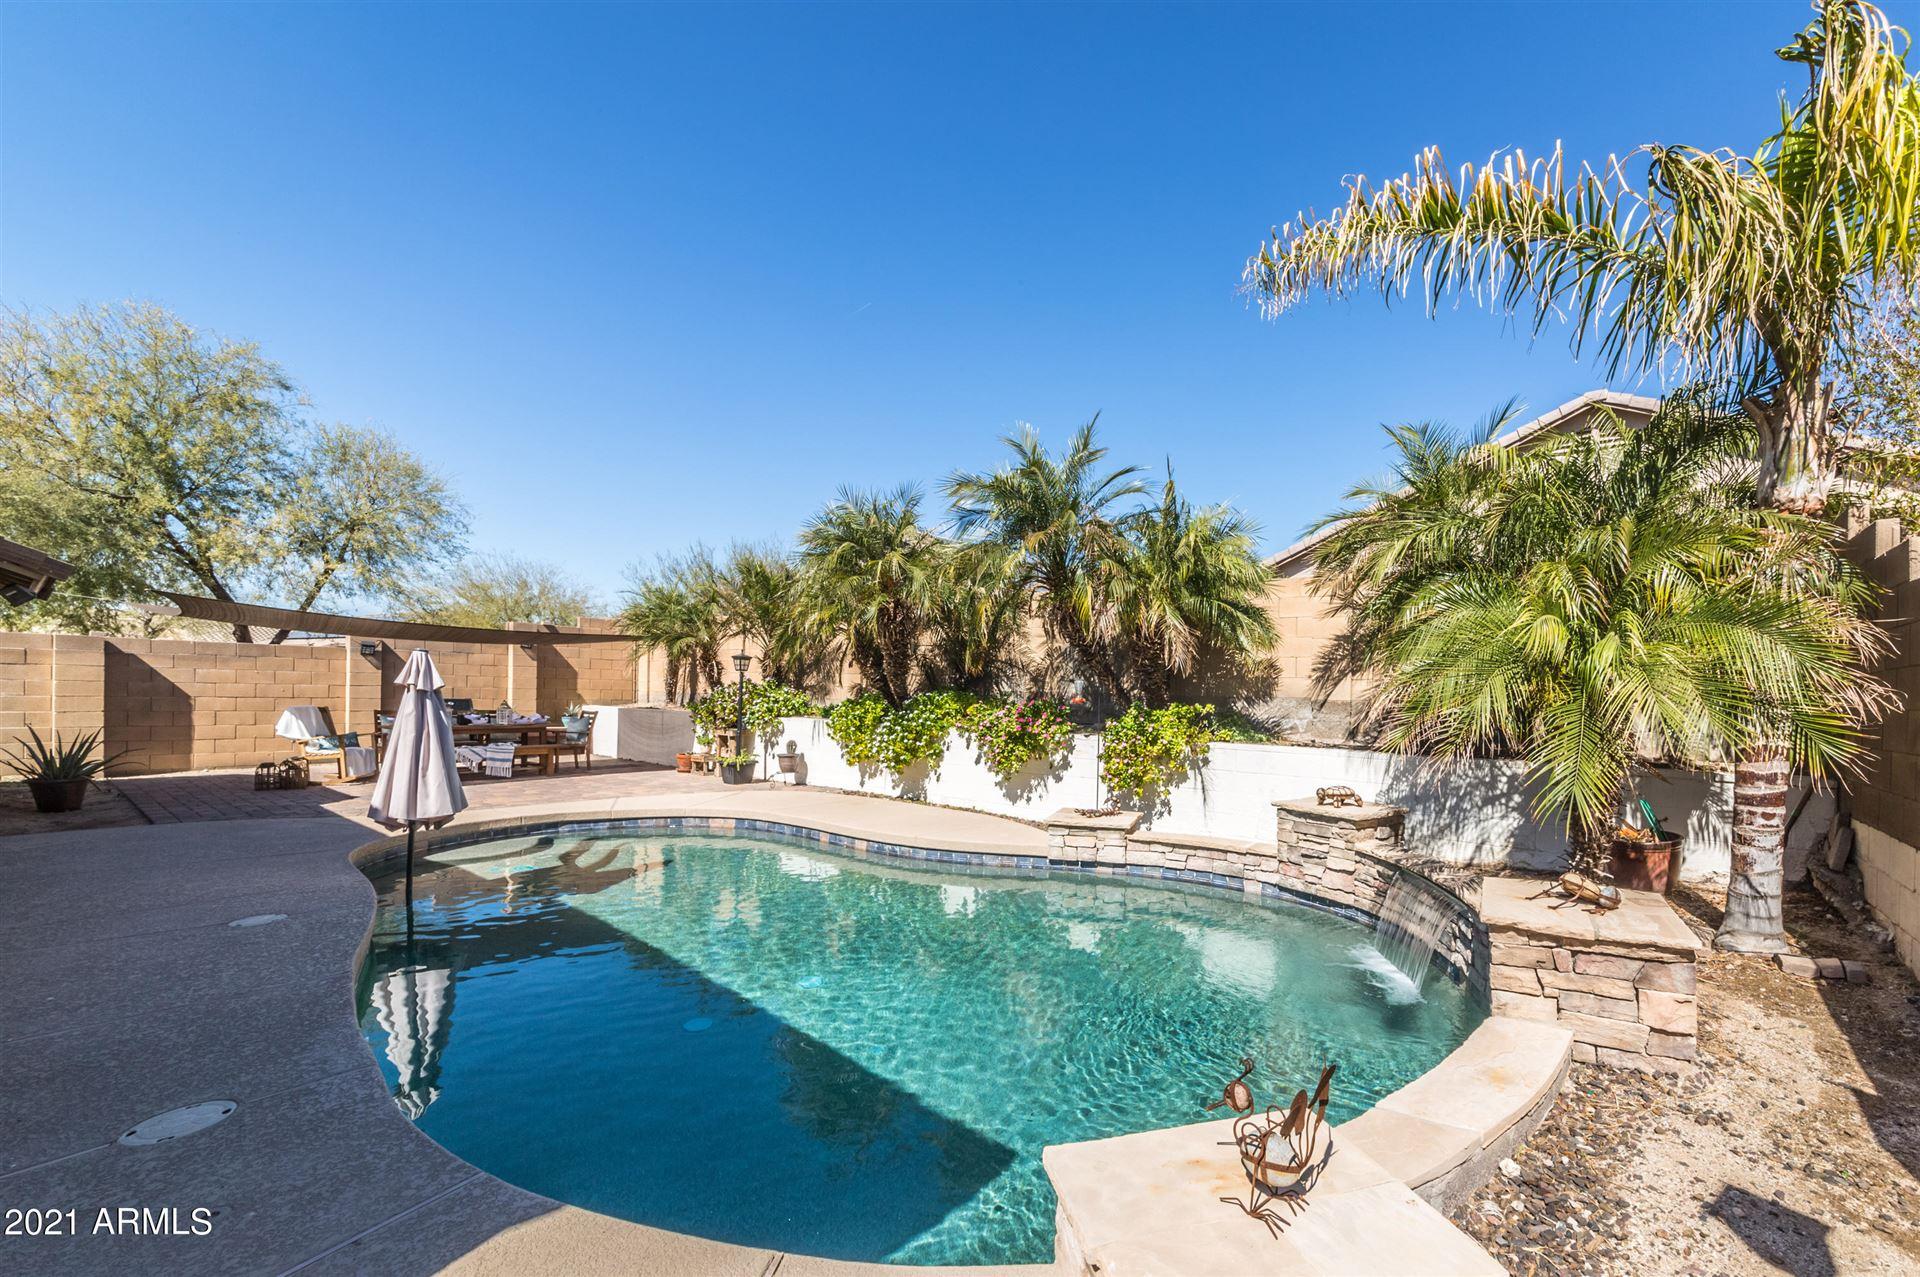 Photo of 25576 W PRIMROSE Lane, Buckeye, AZ 85326 (MLS # 6198817)